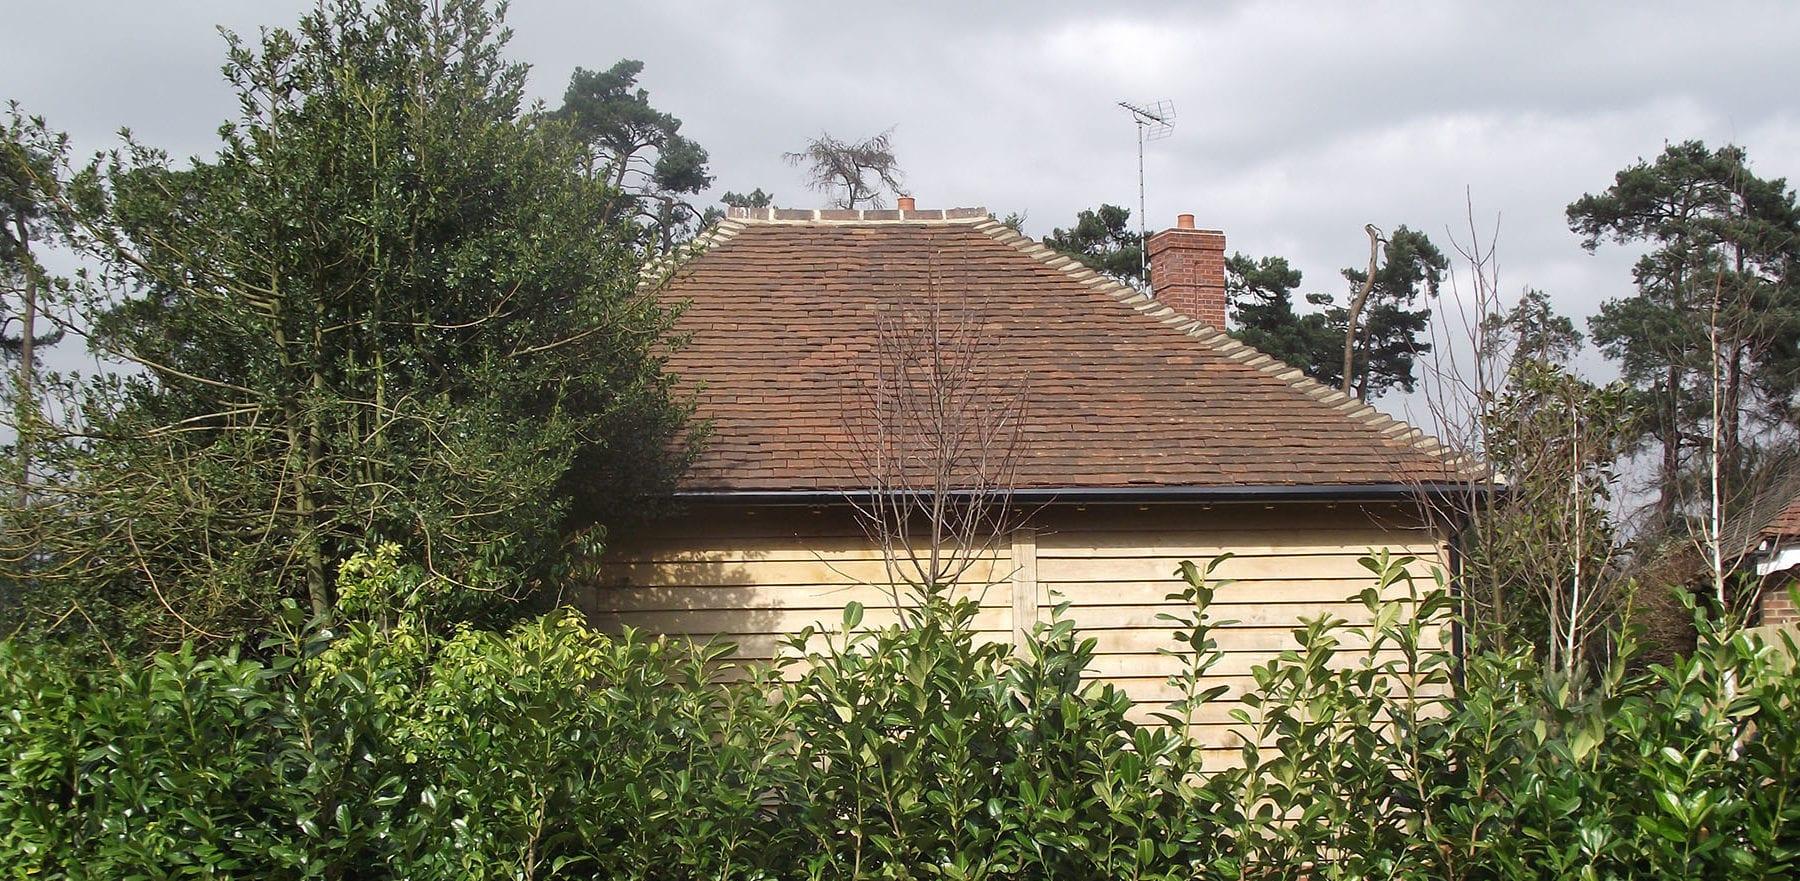 Lifestiles - Handmade Restoration Clay Roof Tiles - Cranleigh, England 4